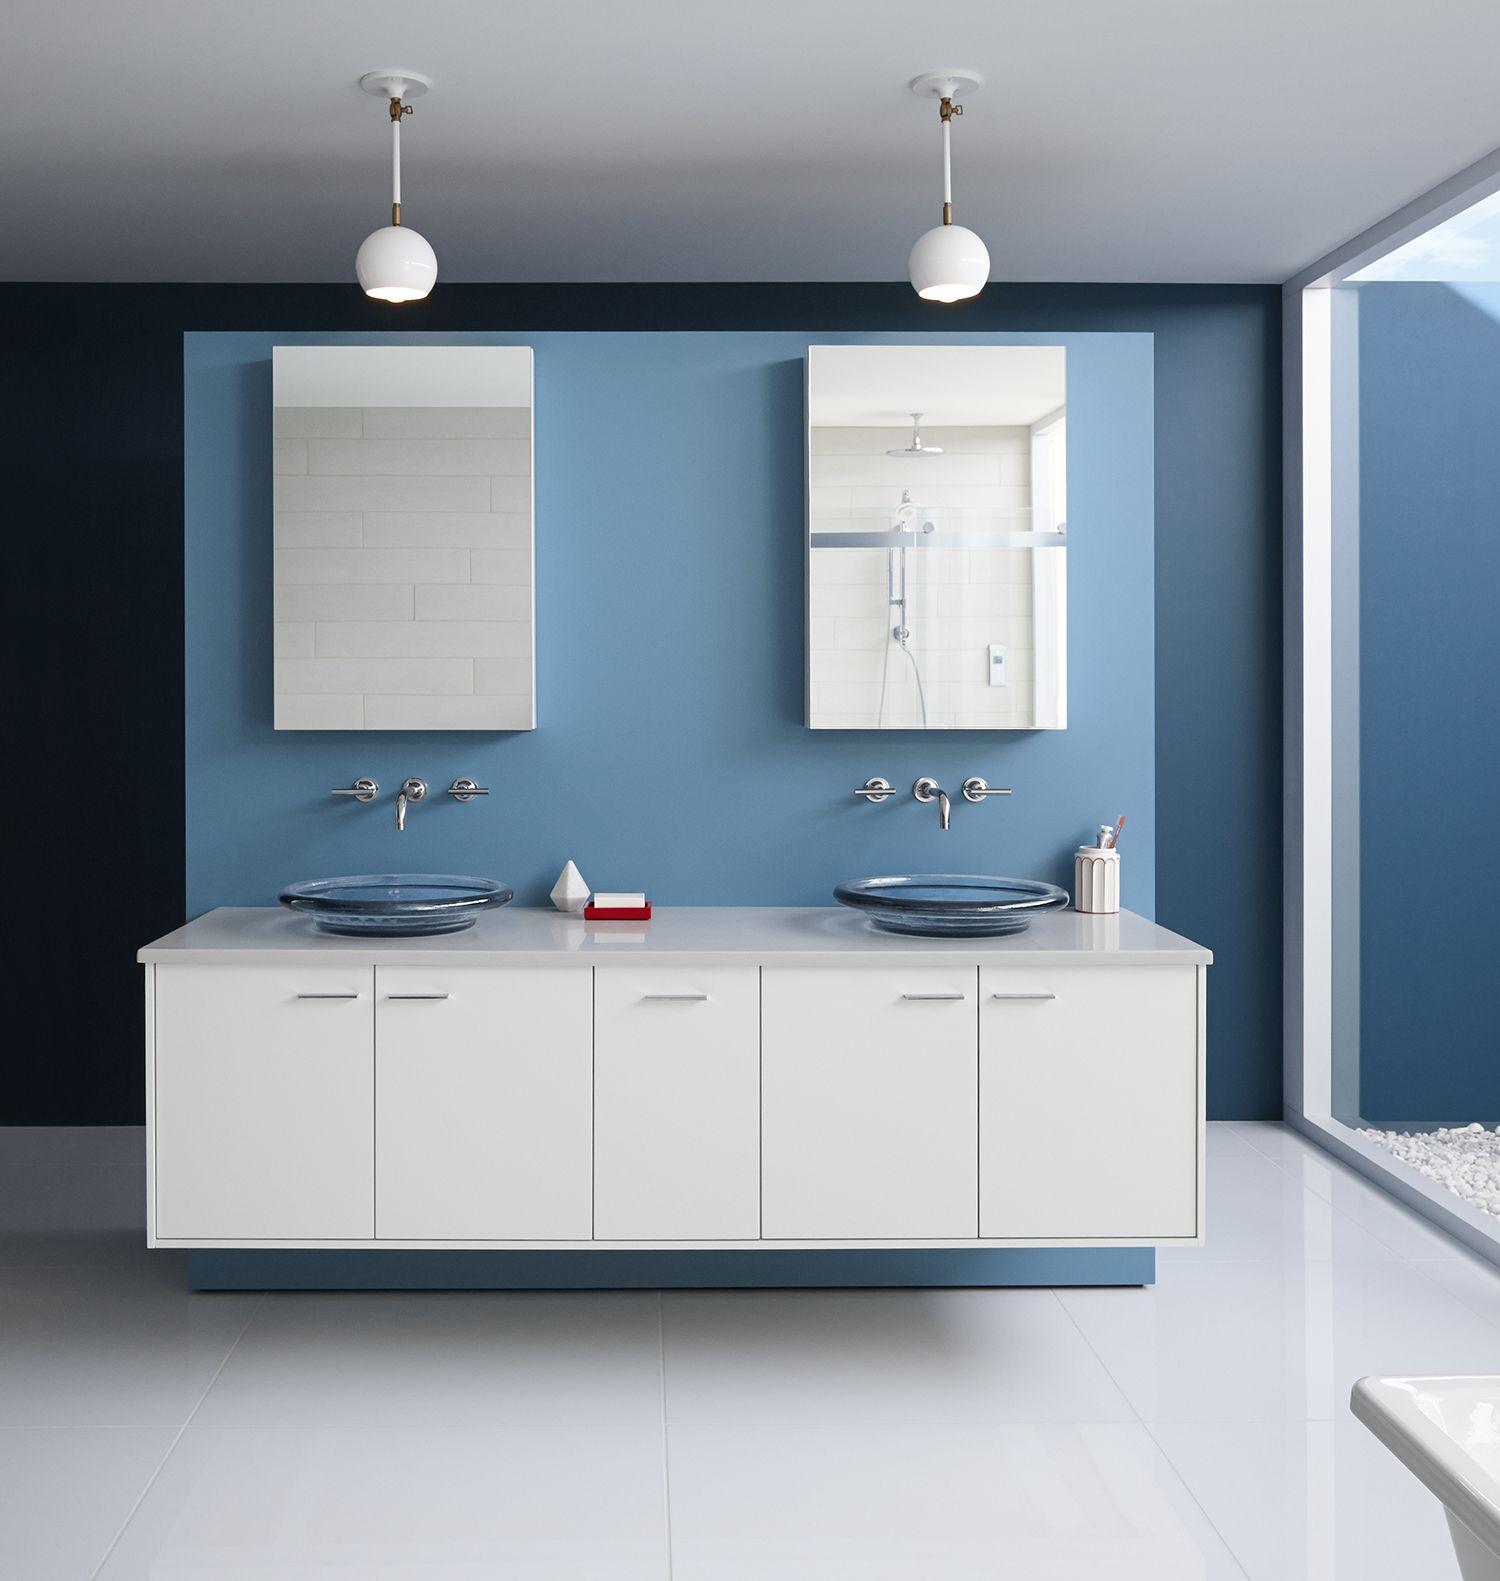 kohleruk bathroomdesign bathroomtrends bathroomideas